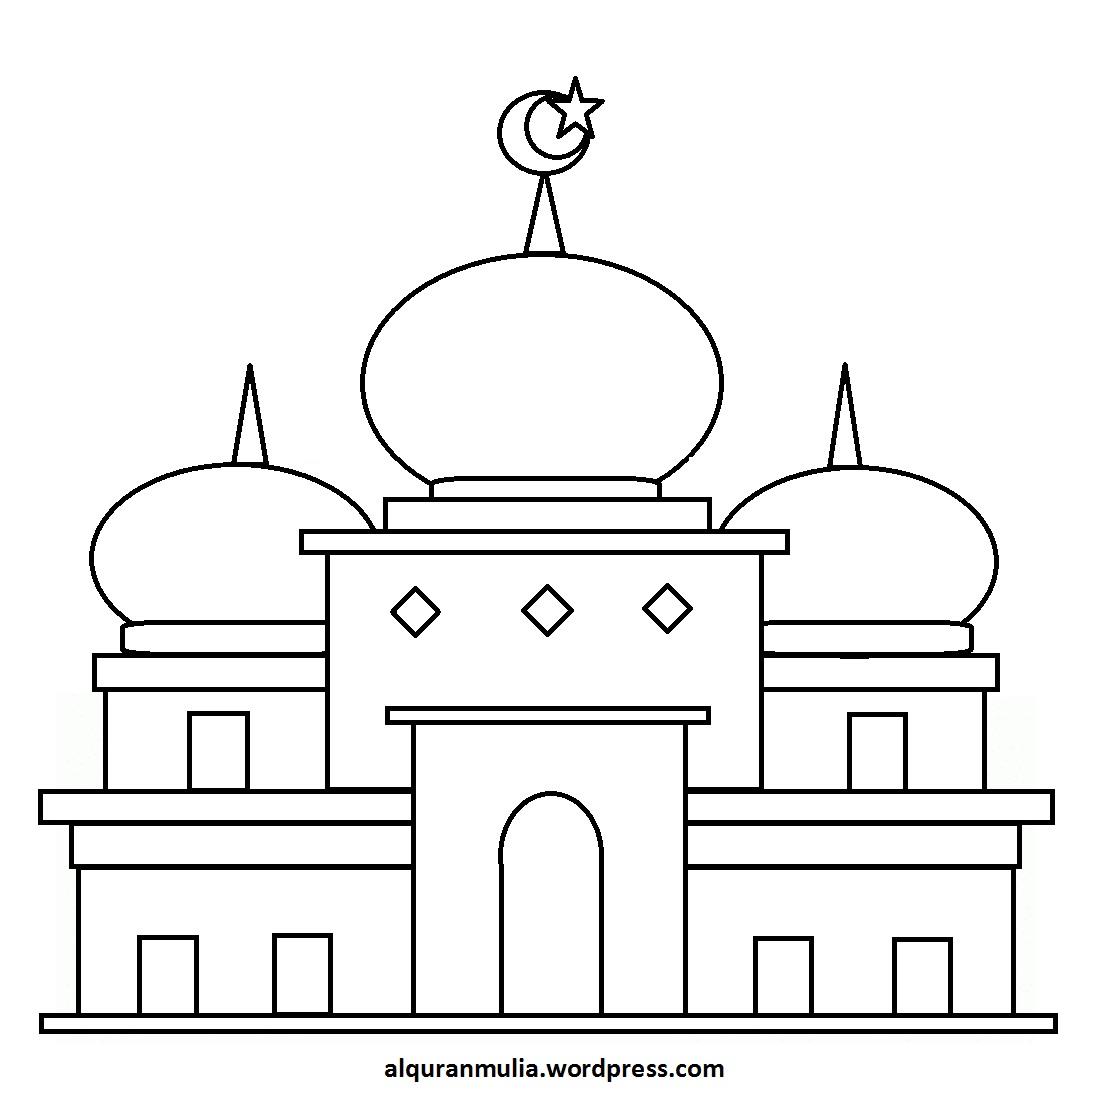 Mewarnai gambar masjid 38 anak muslim